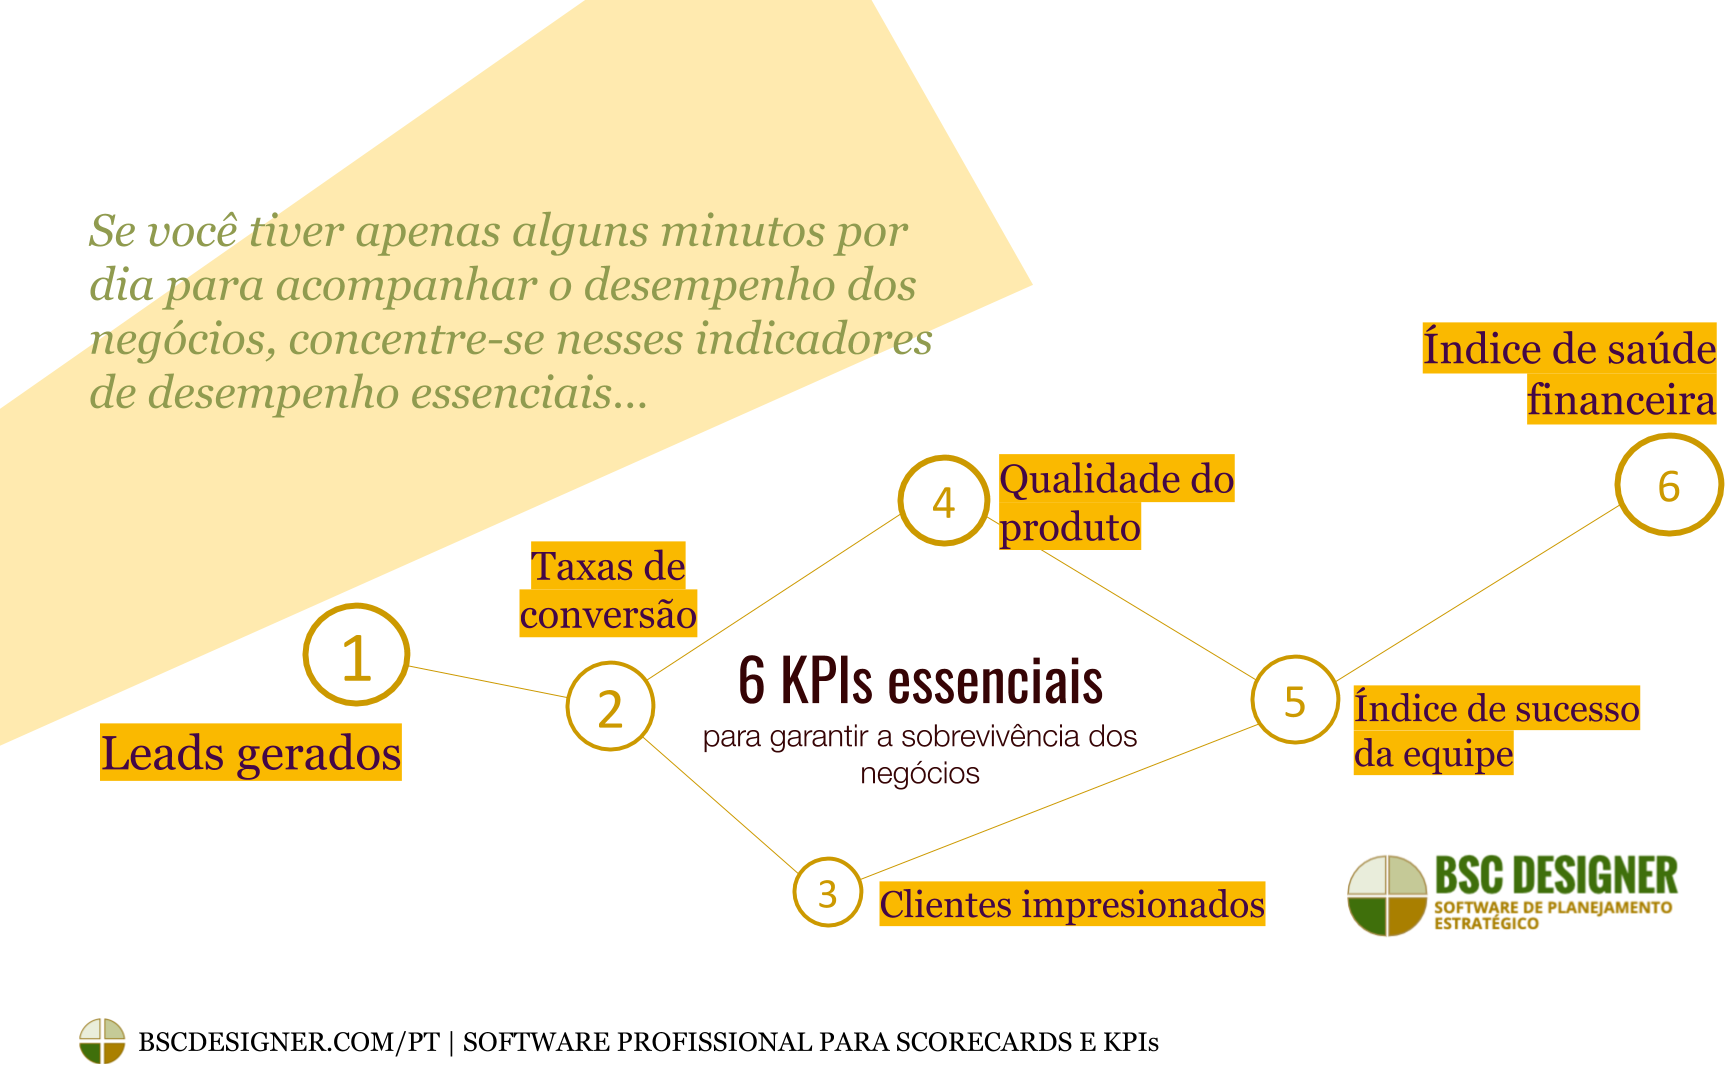 6 KPIs essenciais to Ensure Business Survival